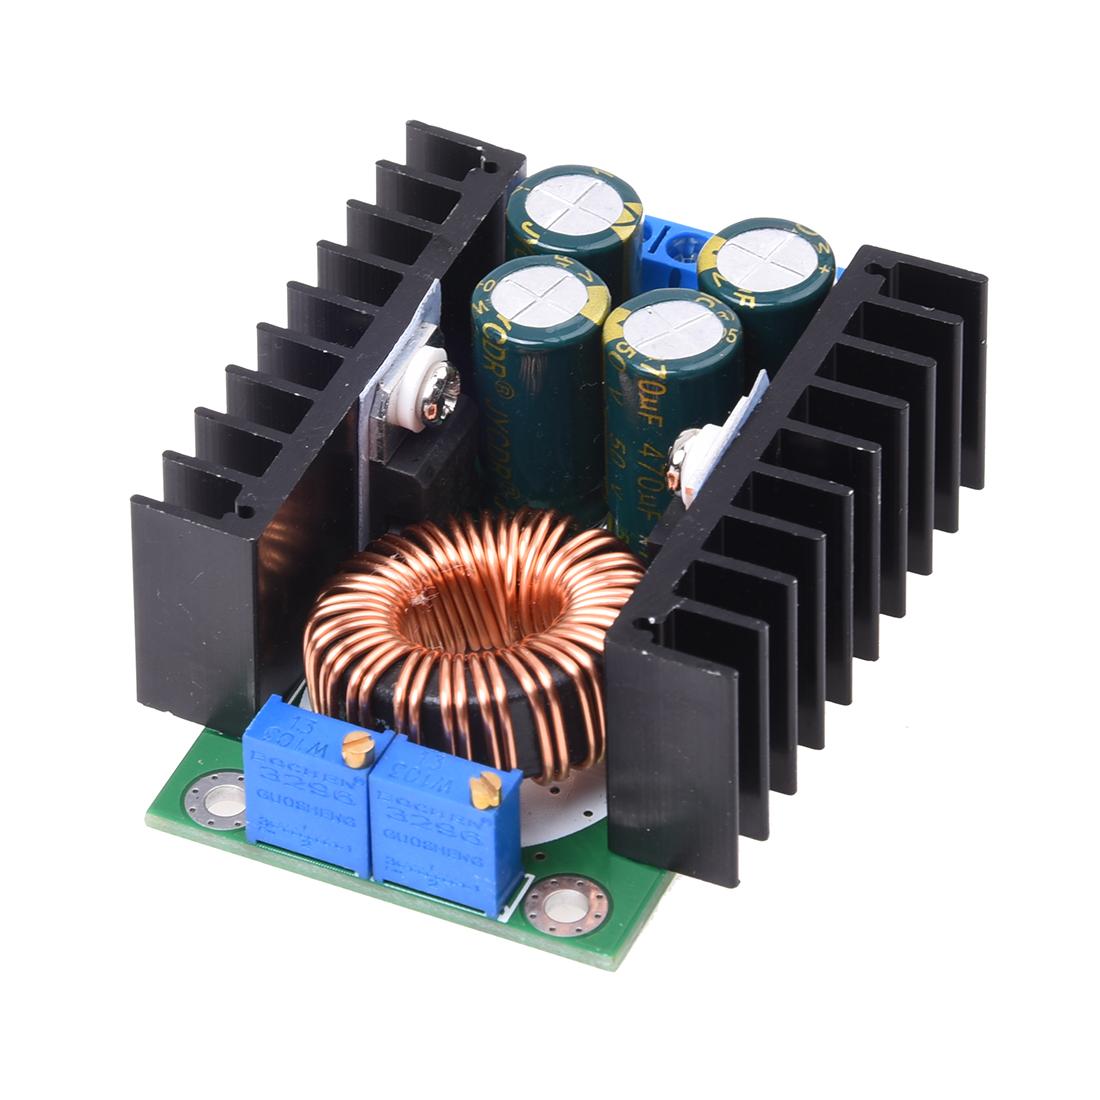 Dc Cc Cv Buck Converter Power Module 7 32v To 08 28v 12a 300w High Low Voltage System Supply 5 6v 12v 14v 24v Battery Charge Package Included 1 X